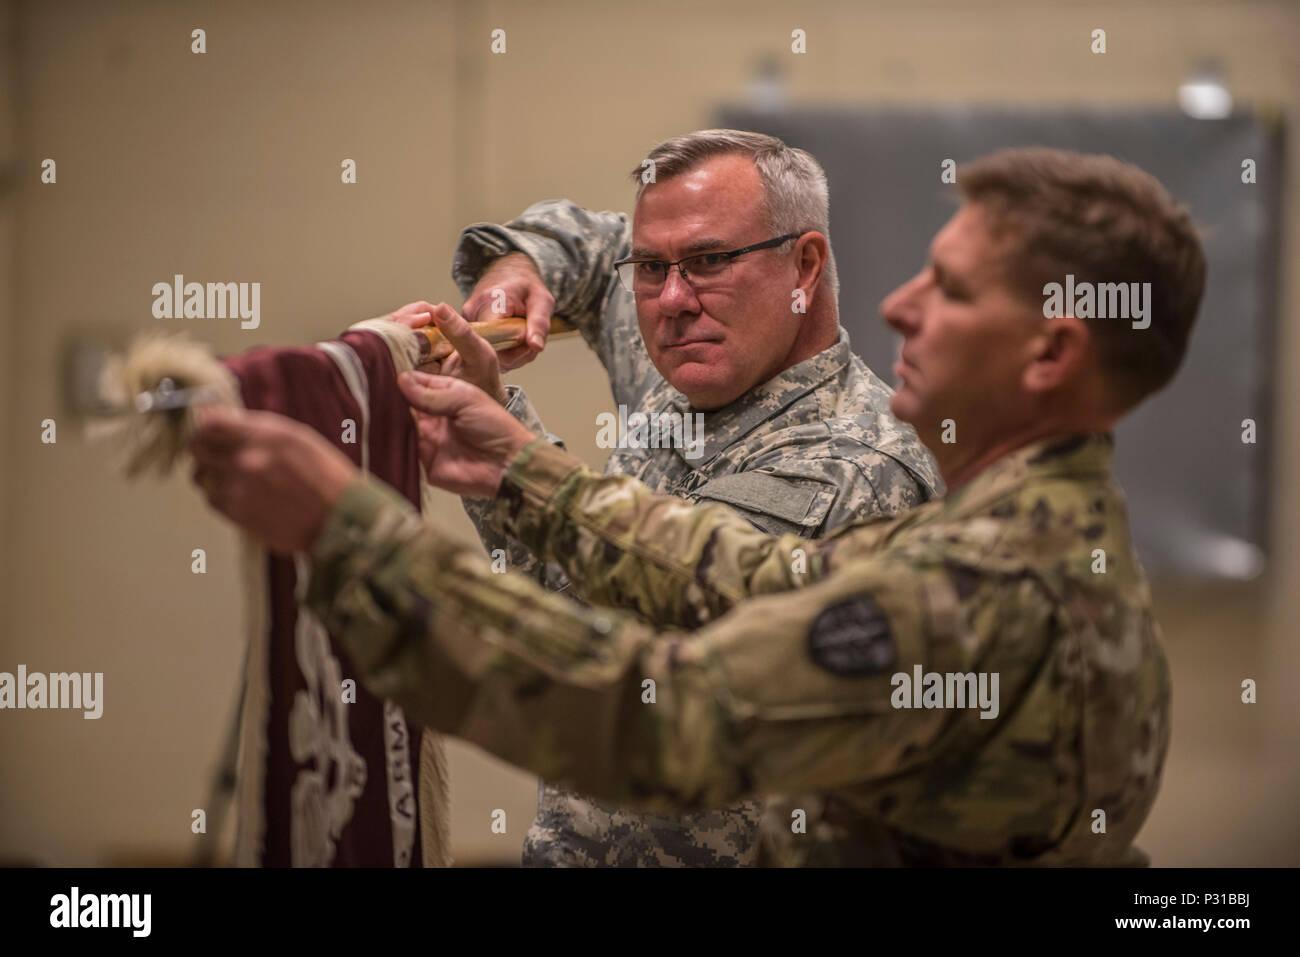 Army Hospital Stock Photos & Army Hospital Stock Images - Alamy